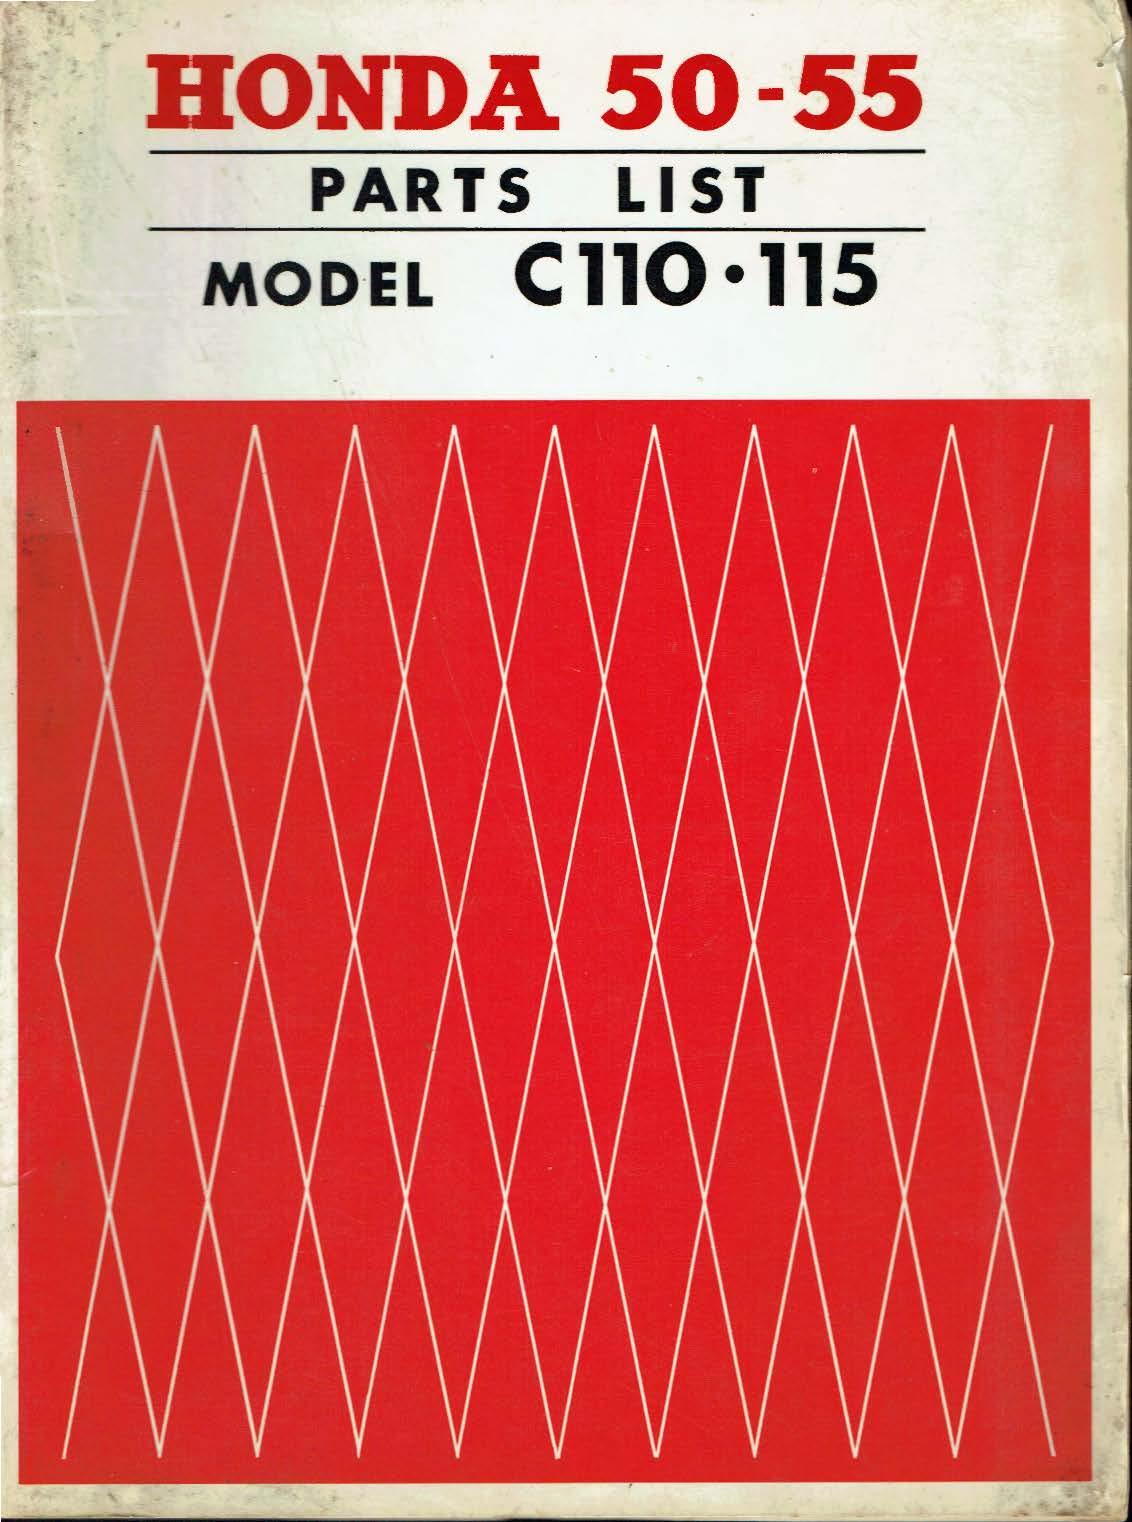 Parts list for Honda C110 (1963)